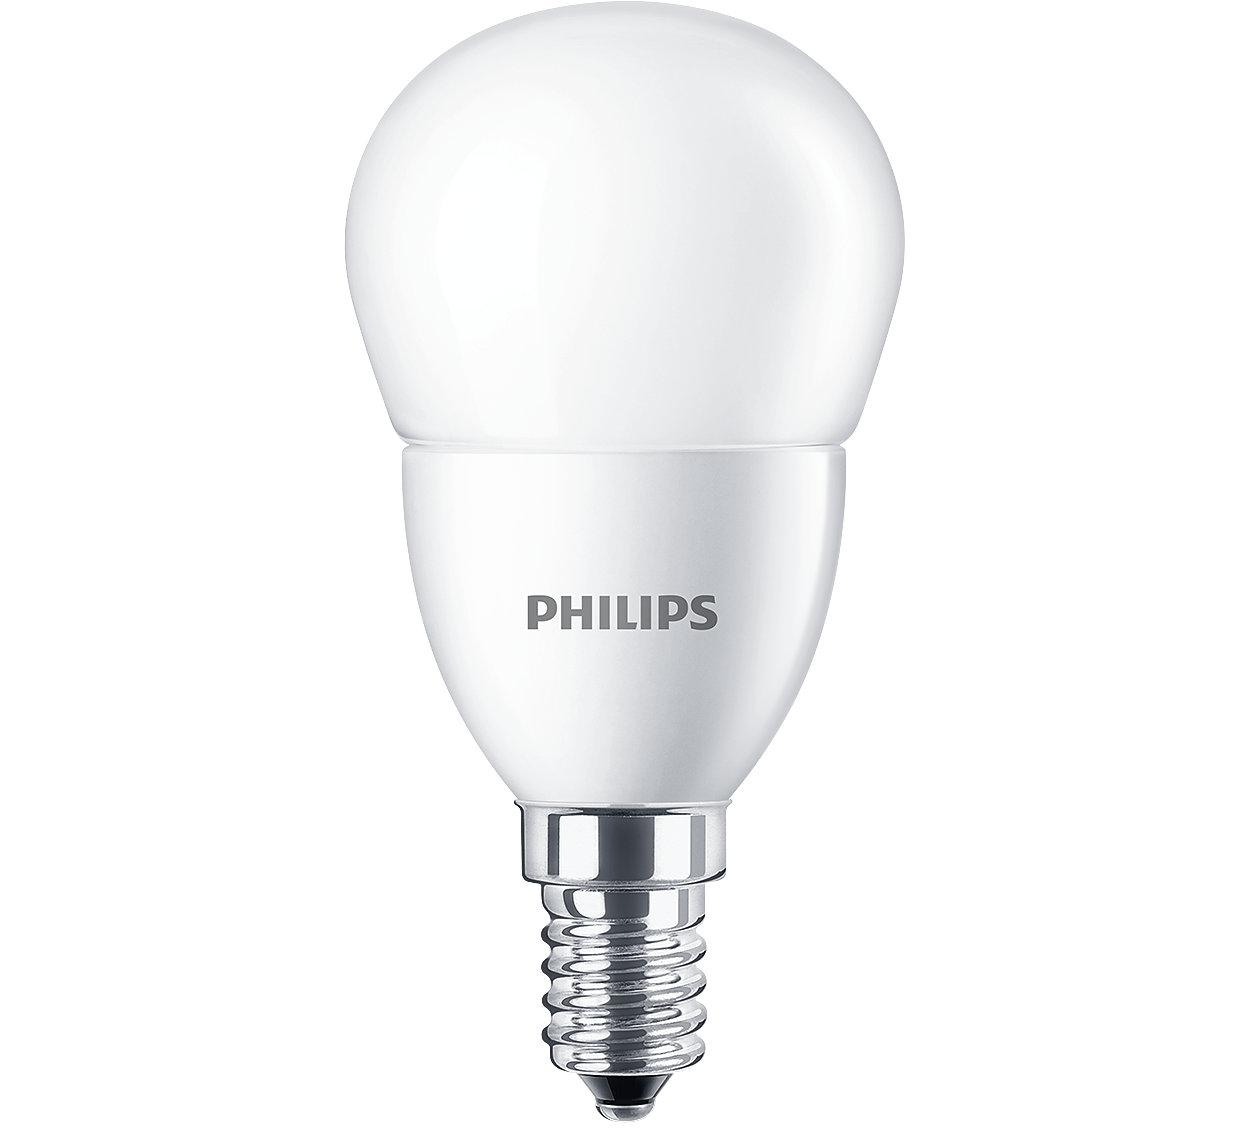 Philips CorePro Velas y Esféricas LED